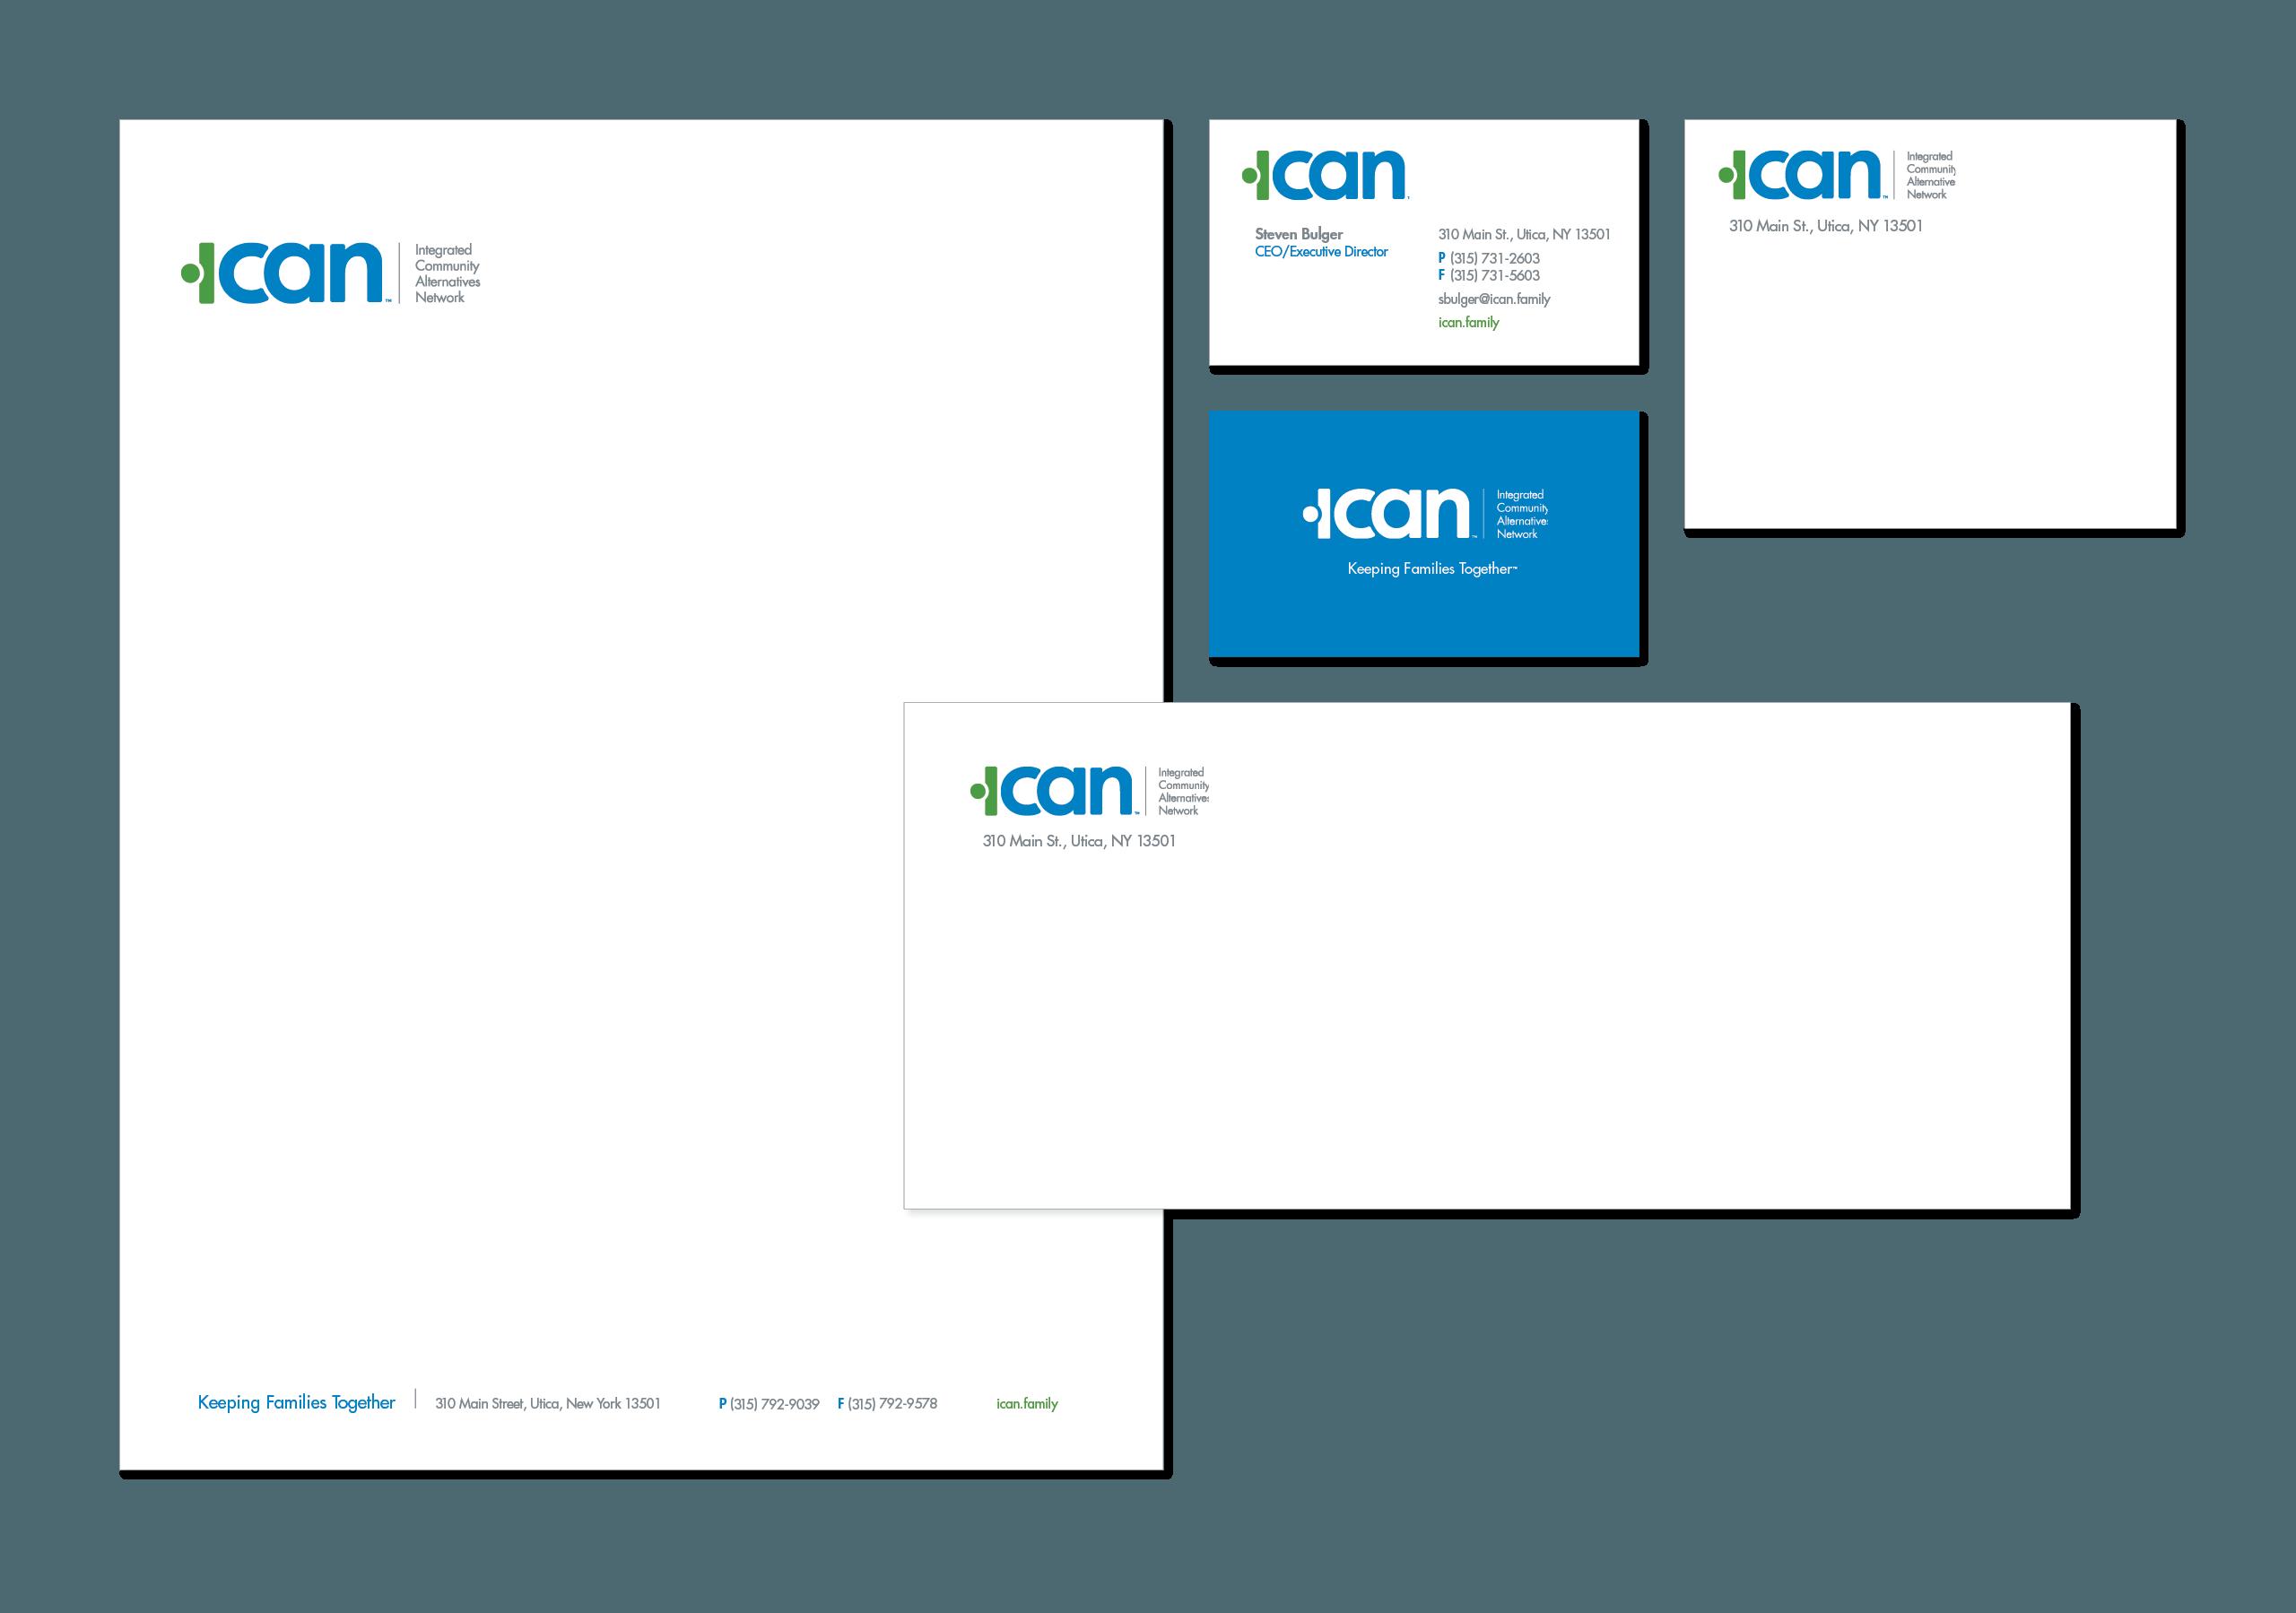 ICAN Panel 3